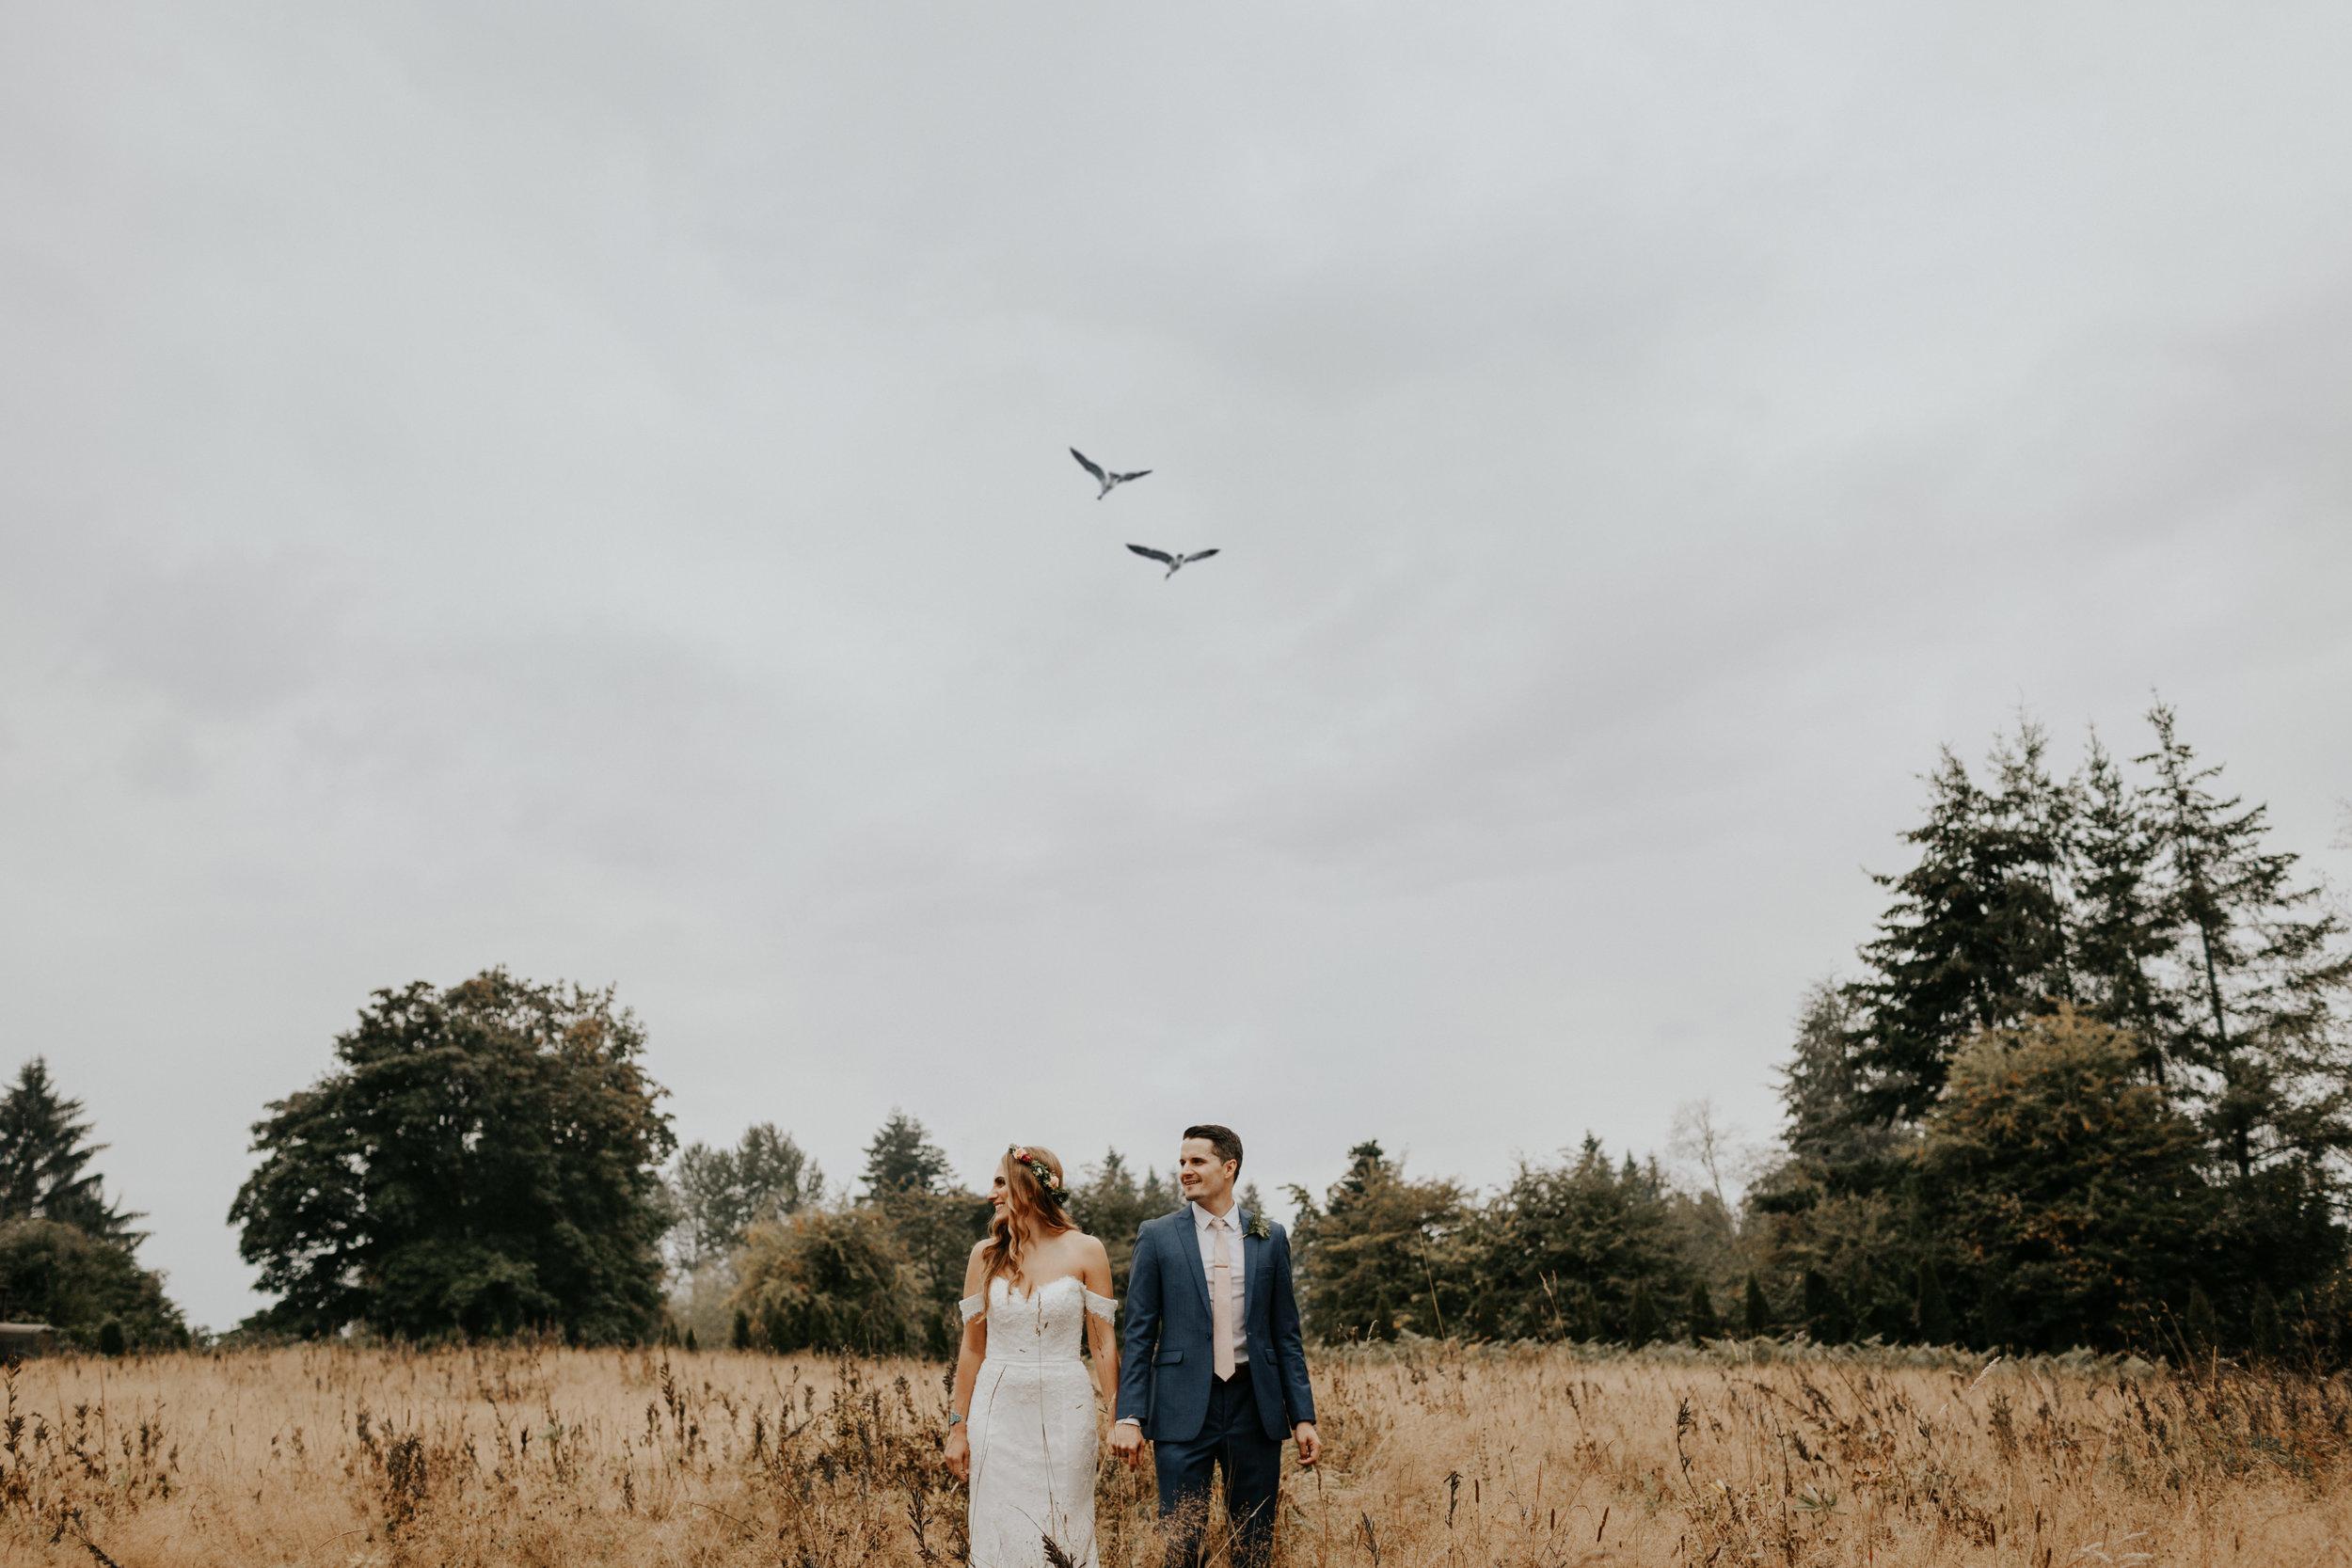 ginapaulson_jakitrevor_wedding-905.jpg